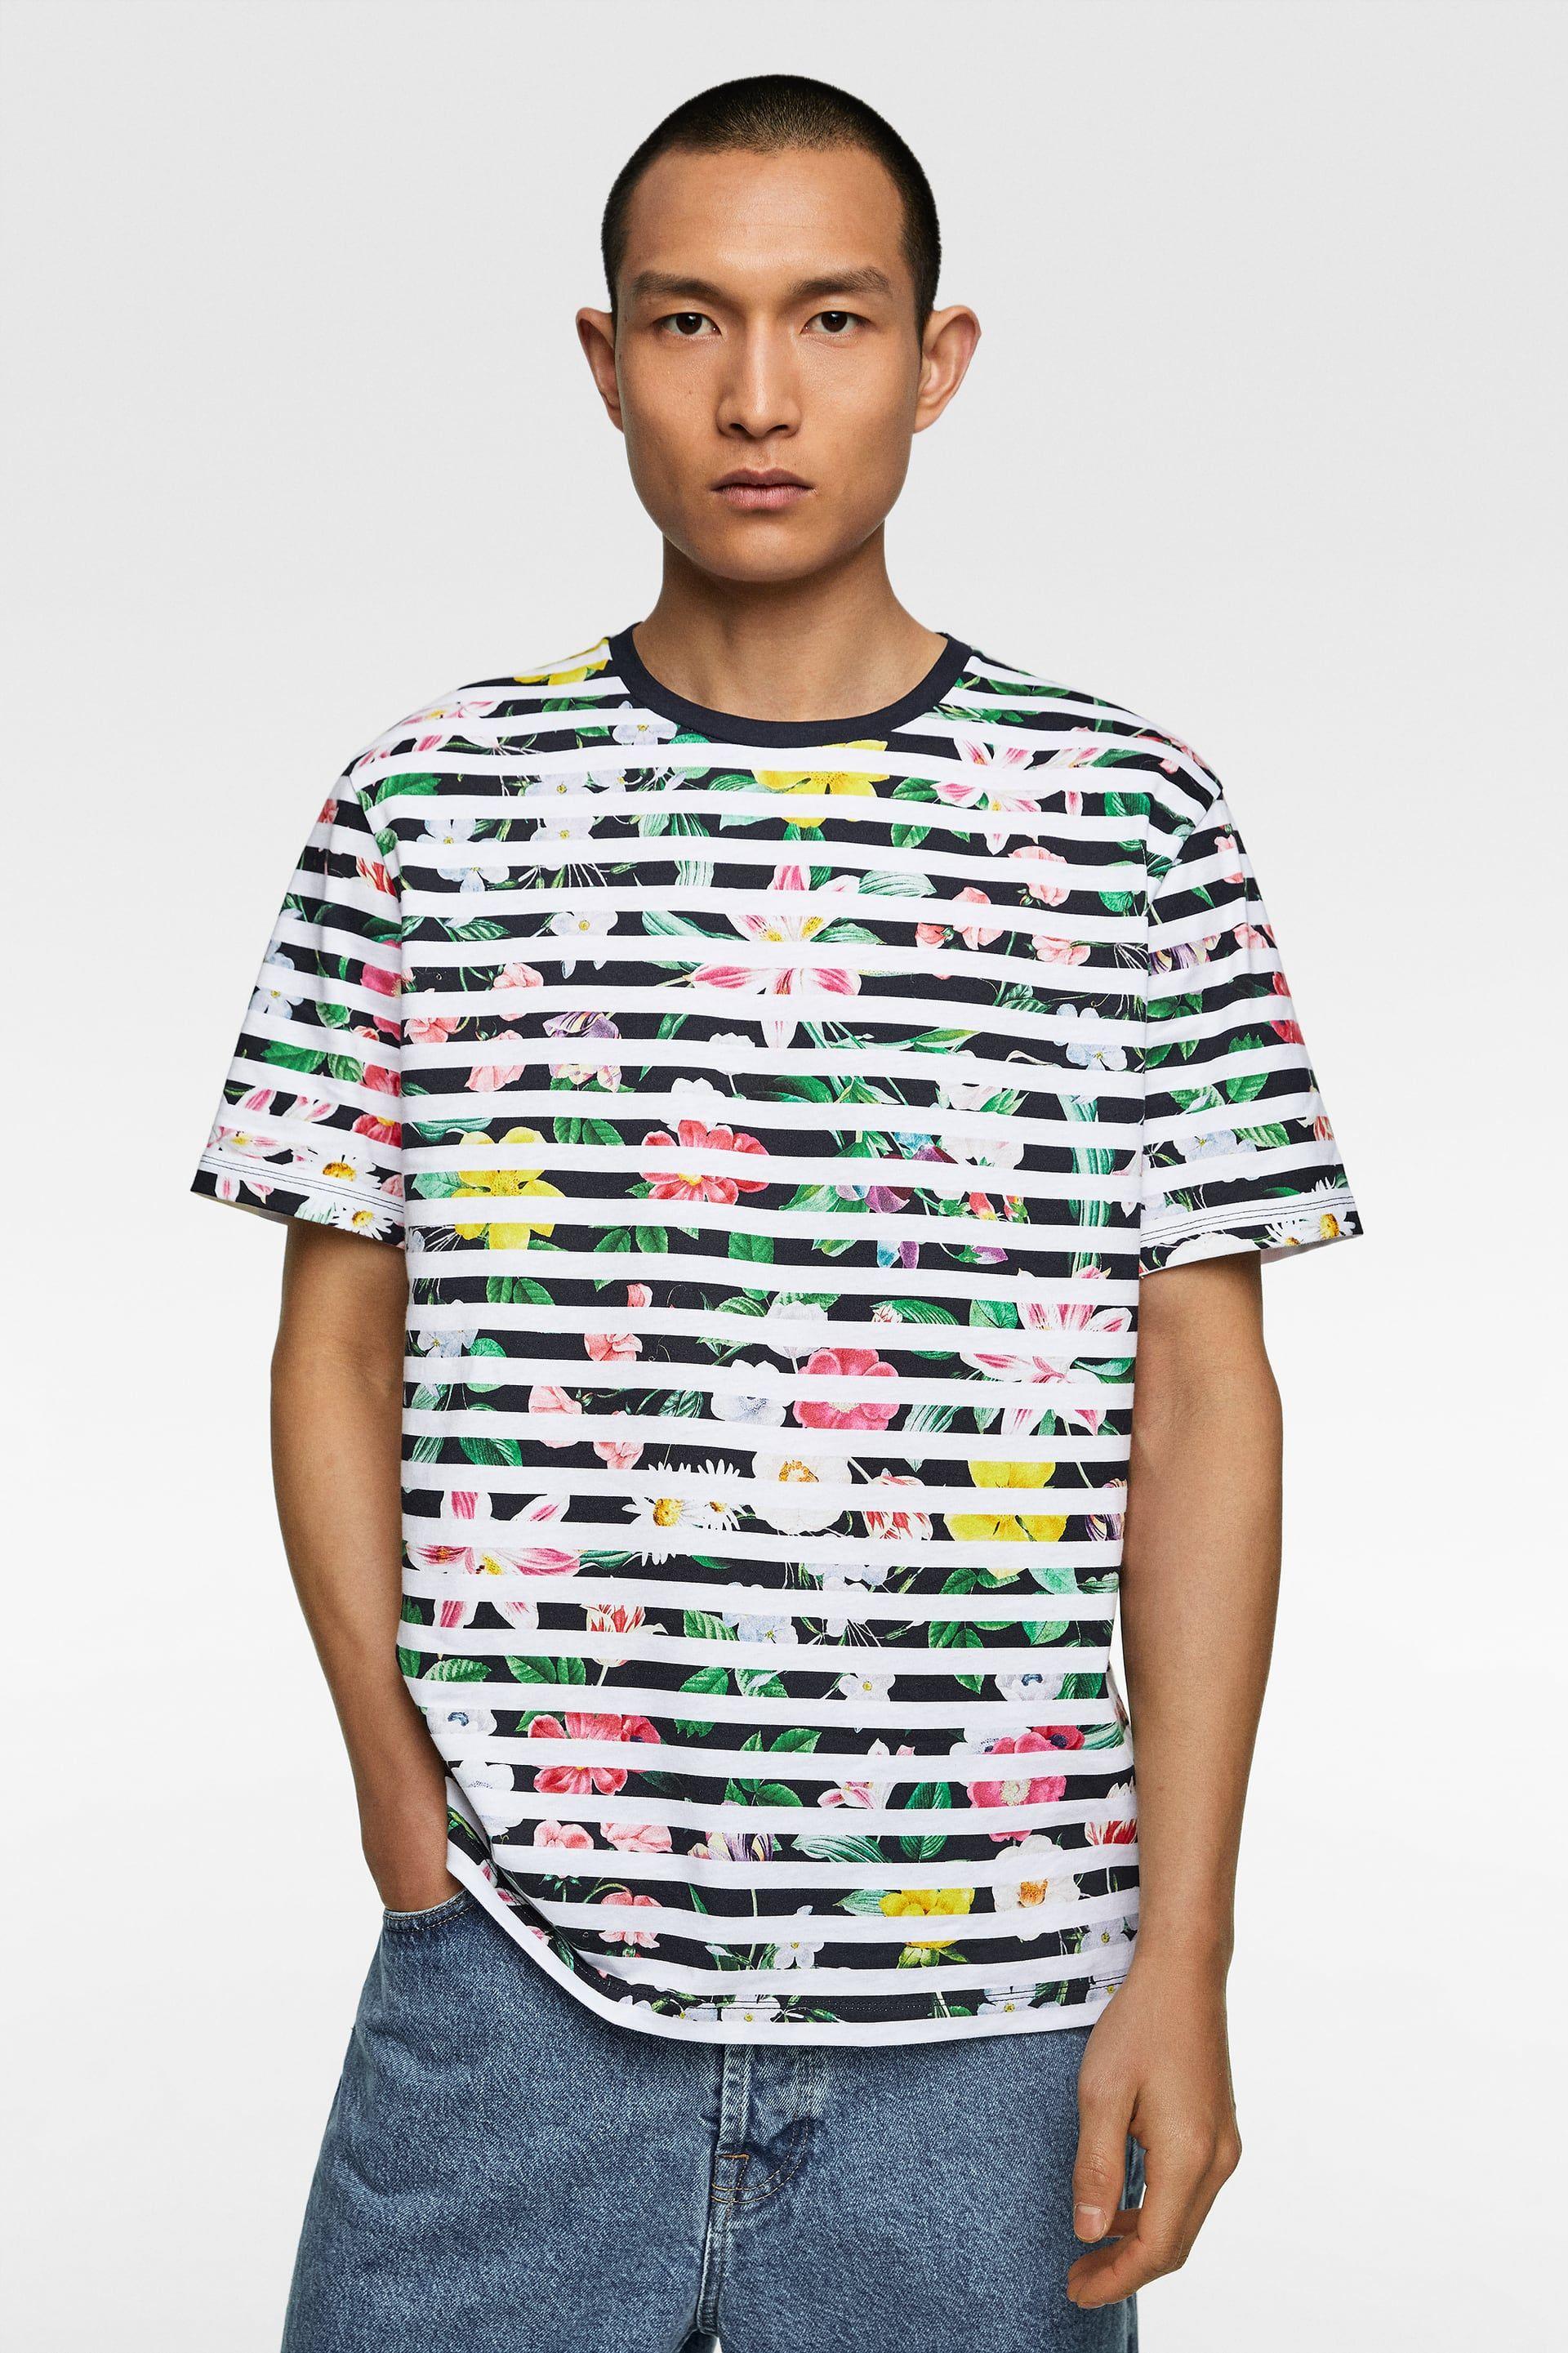 934c3e2a6b Striped floral print shirt | Marrakech Clothes | Floral print shirt ...